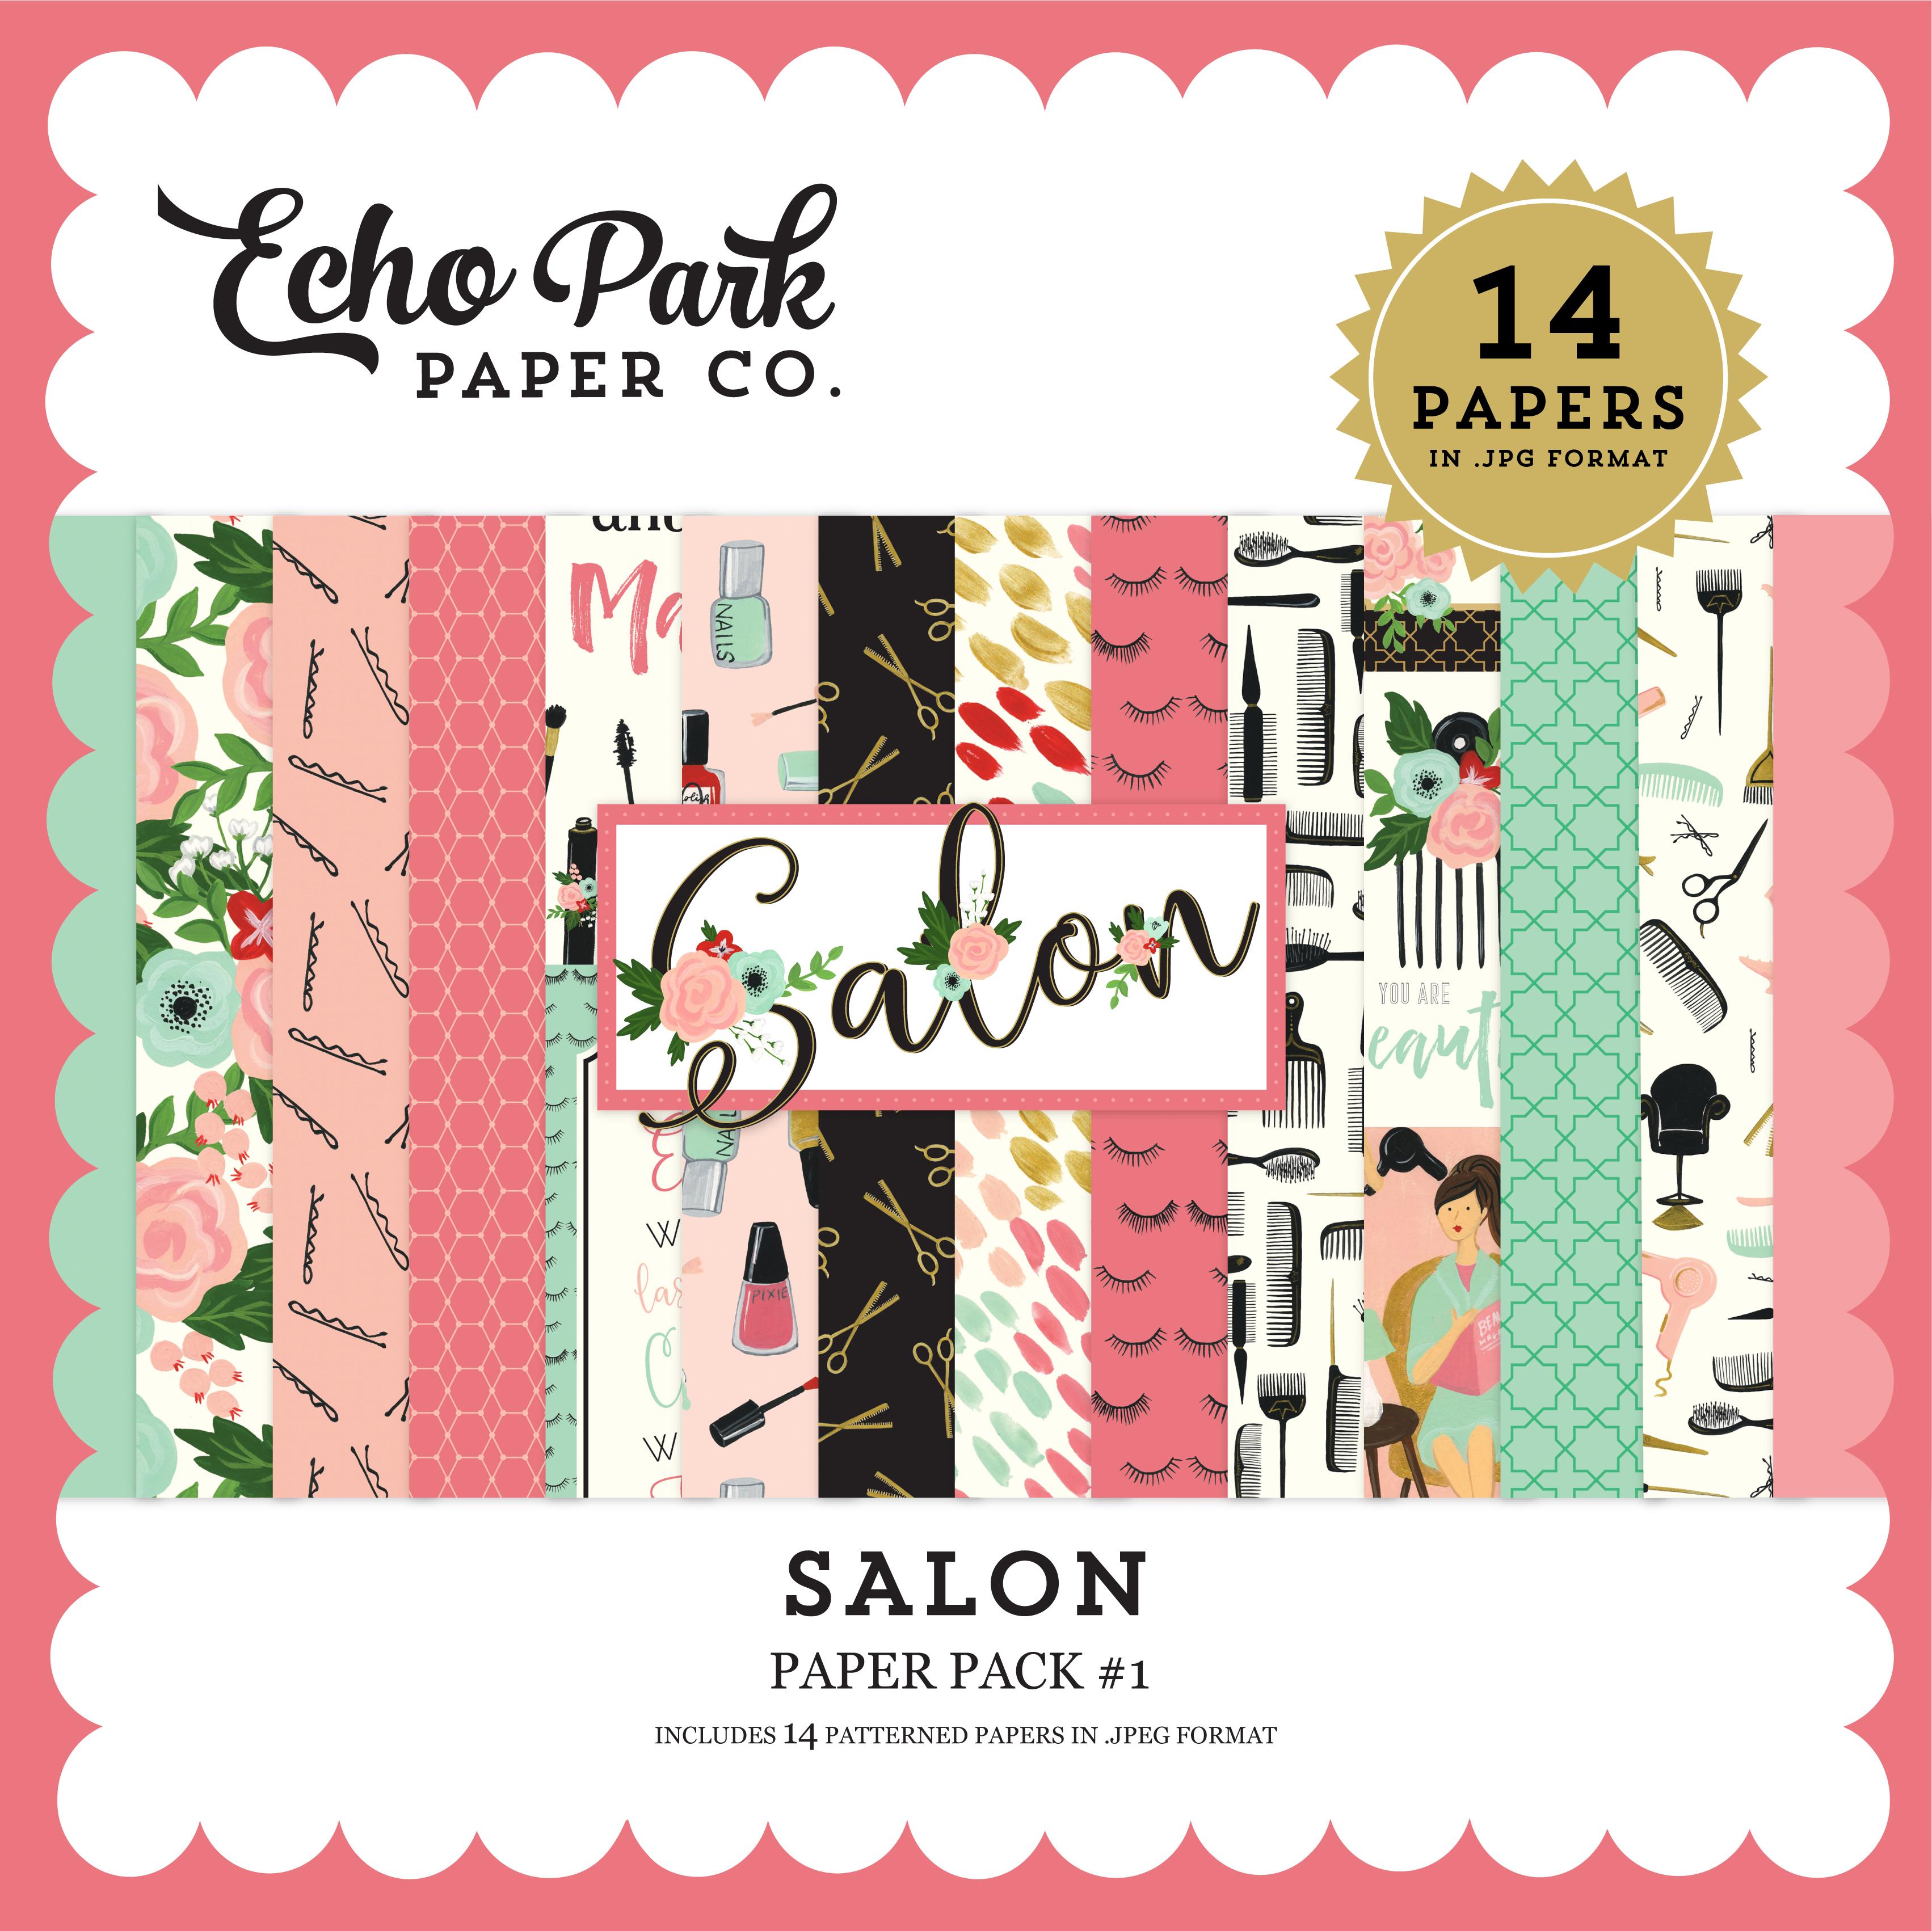 Salon Paper Pack #1